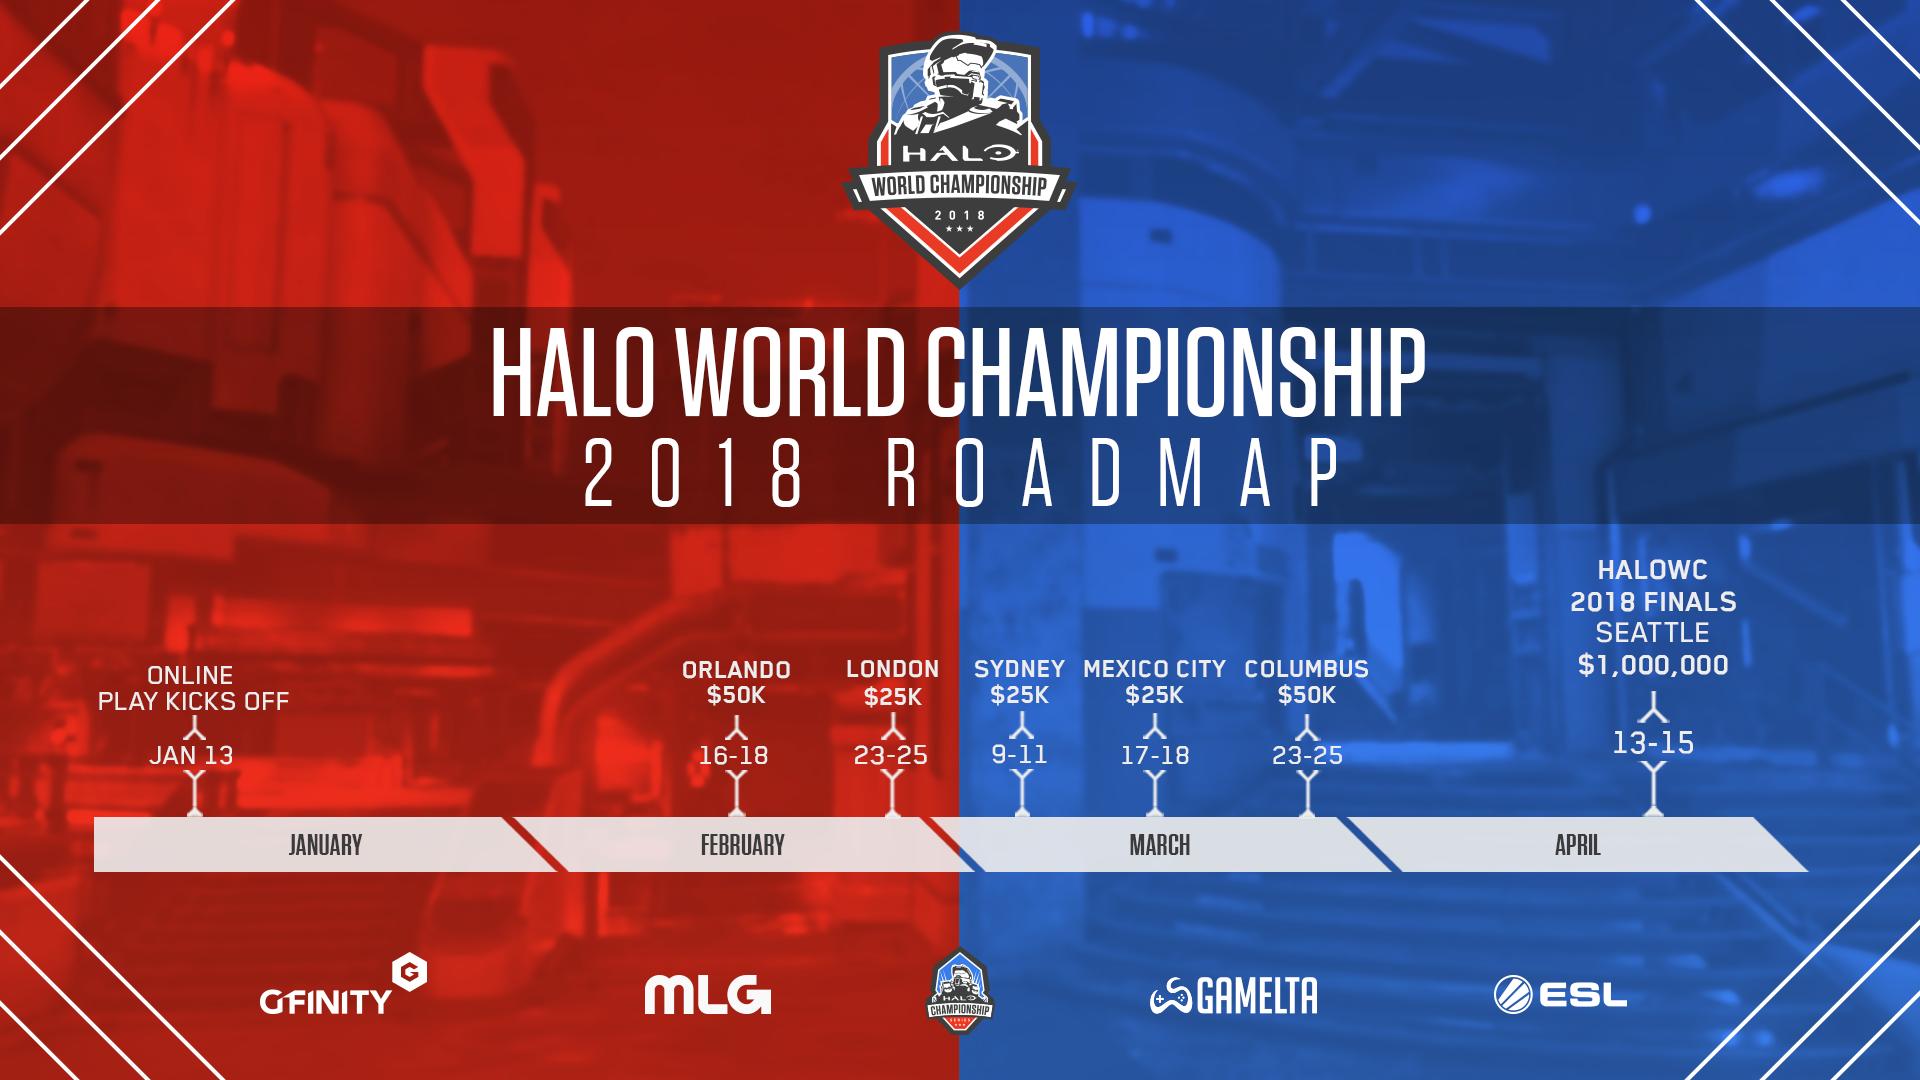 Halo World Championship 2018 Road Map